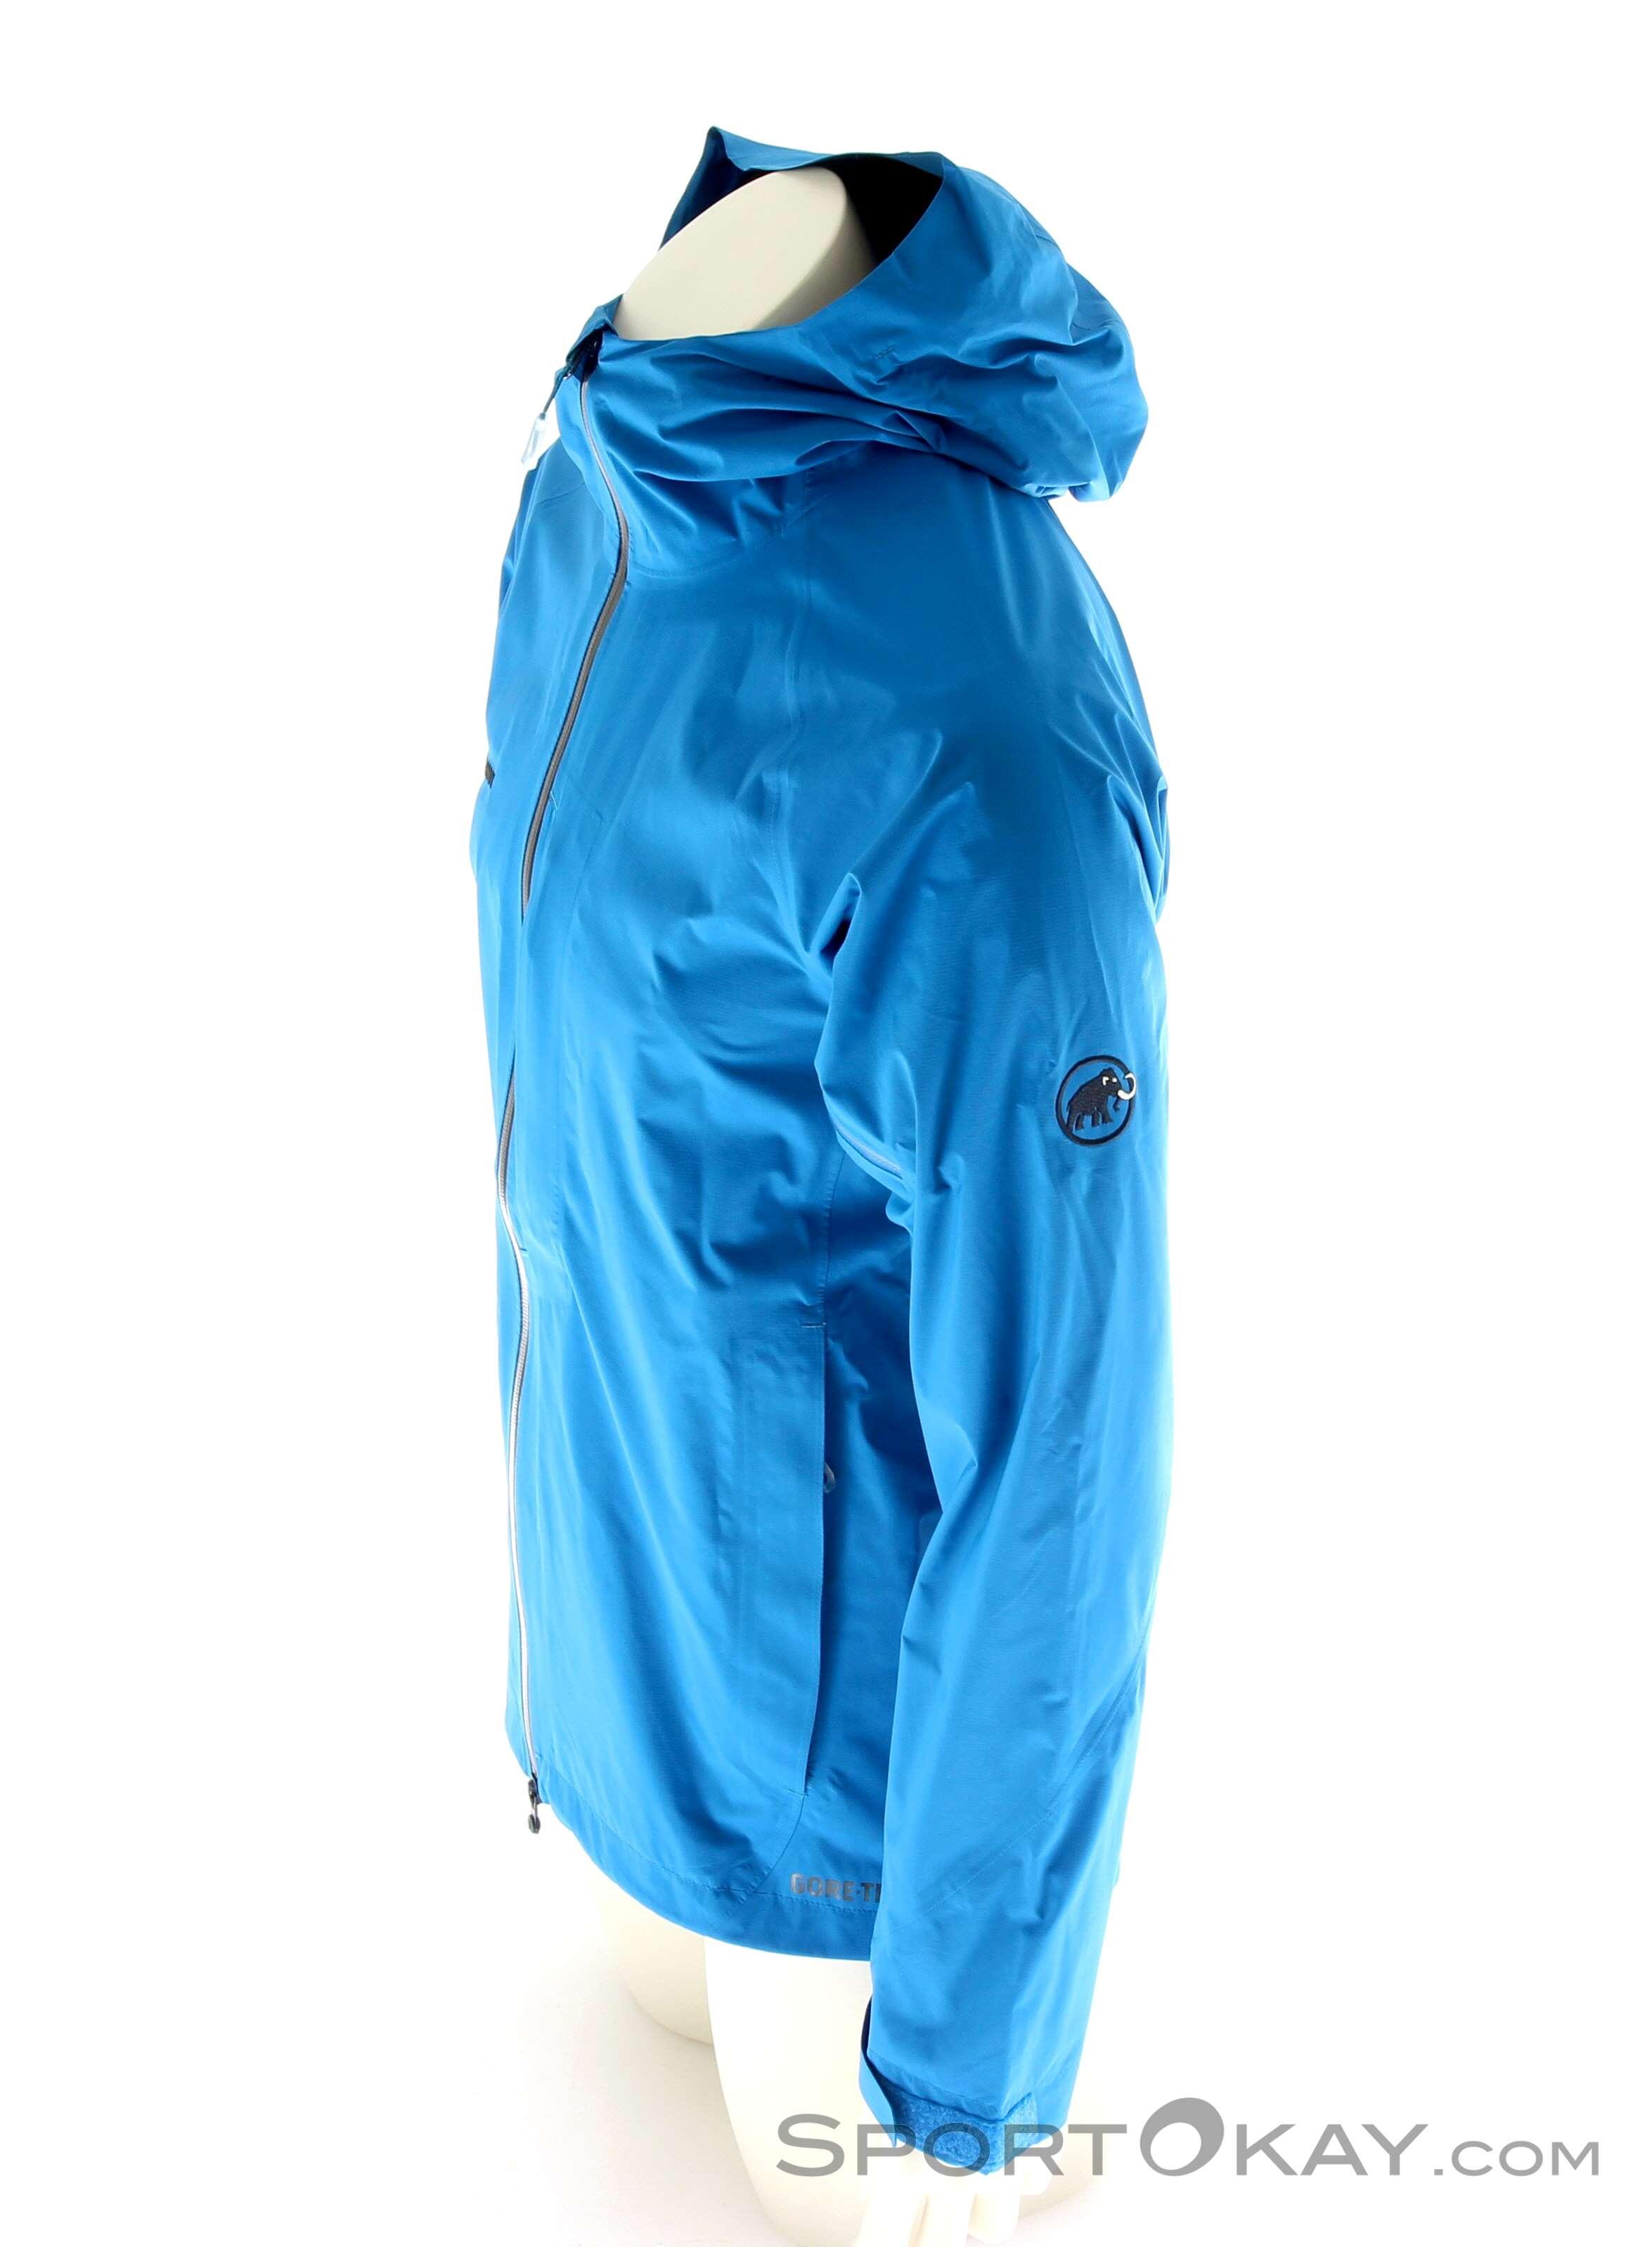 Mens jacket hs code - Mammut Runbold Guide Hs Jacket Mens Ski Touring Jacket Mammut Blue Male